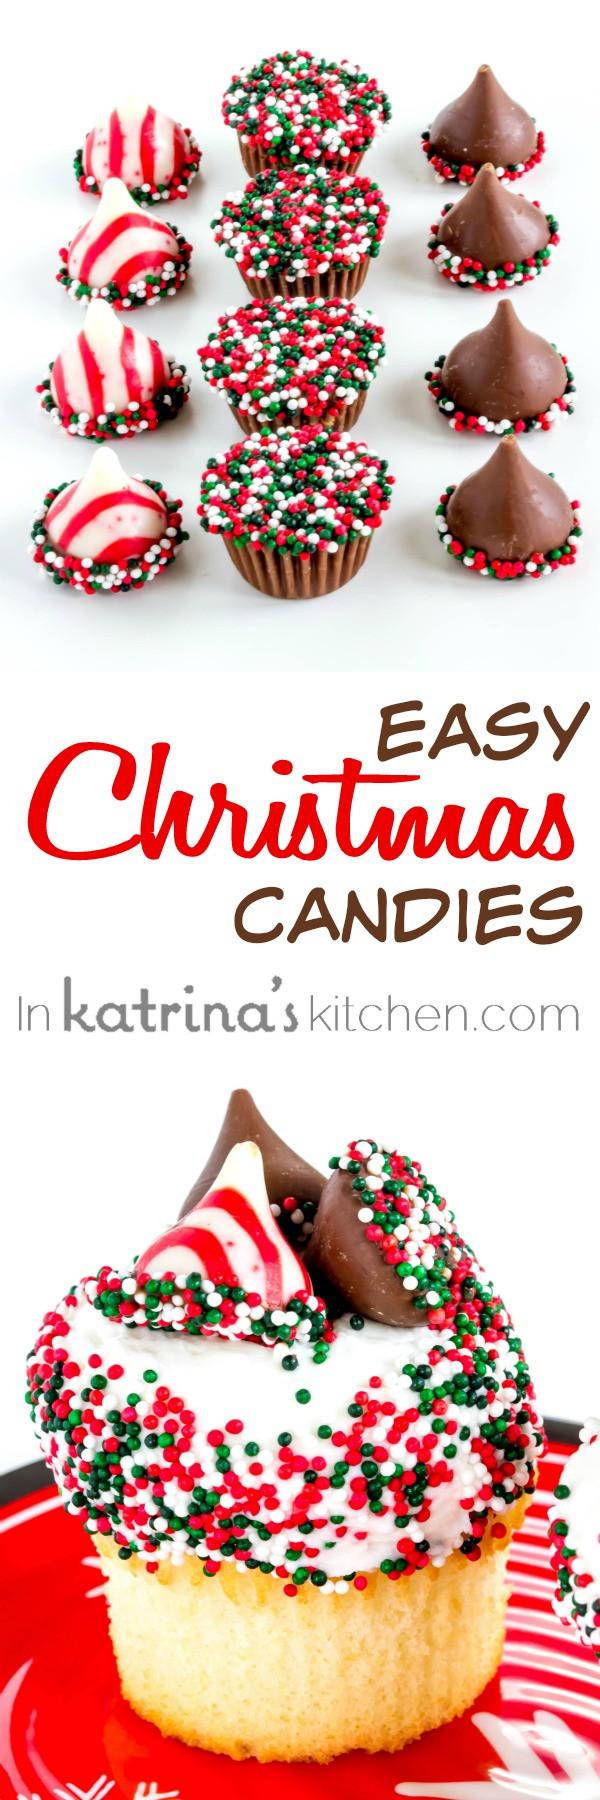 Easy Homemade Christmas Candy  Easy Christmas Candy